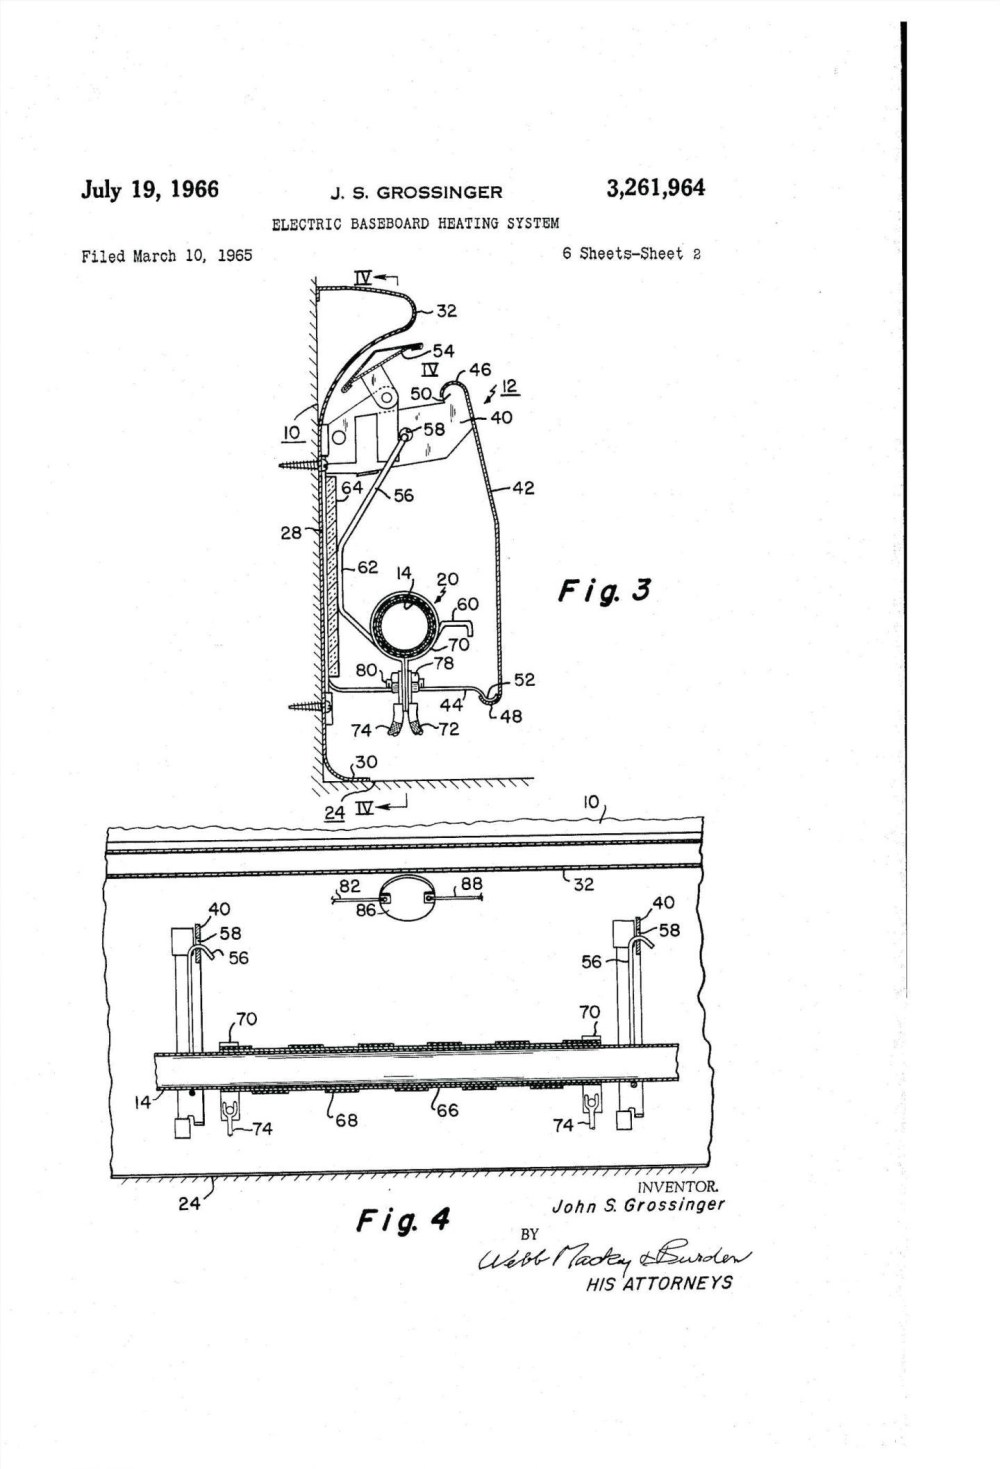 medium resolution of fostoria heater wiring diagram wiring diagram for qmark heater save wiring diagram likewise rh eugrab